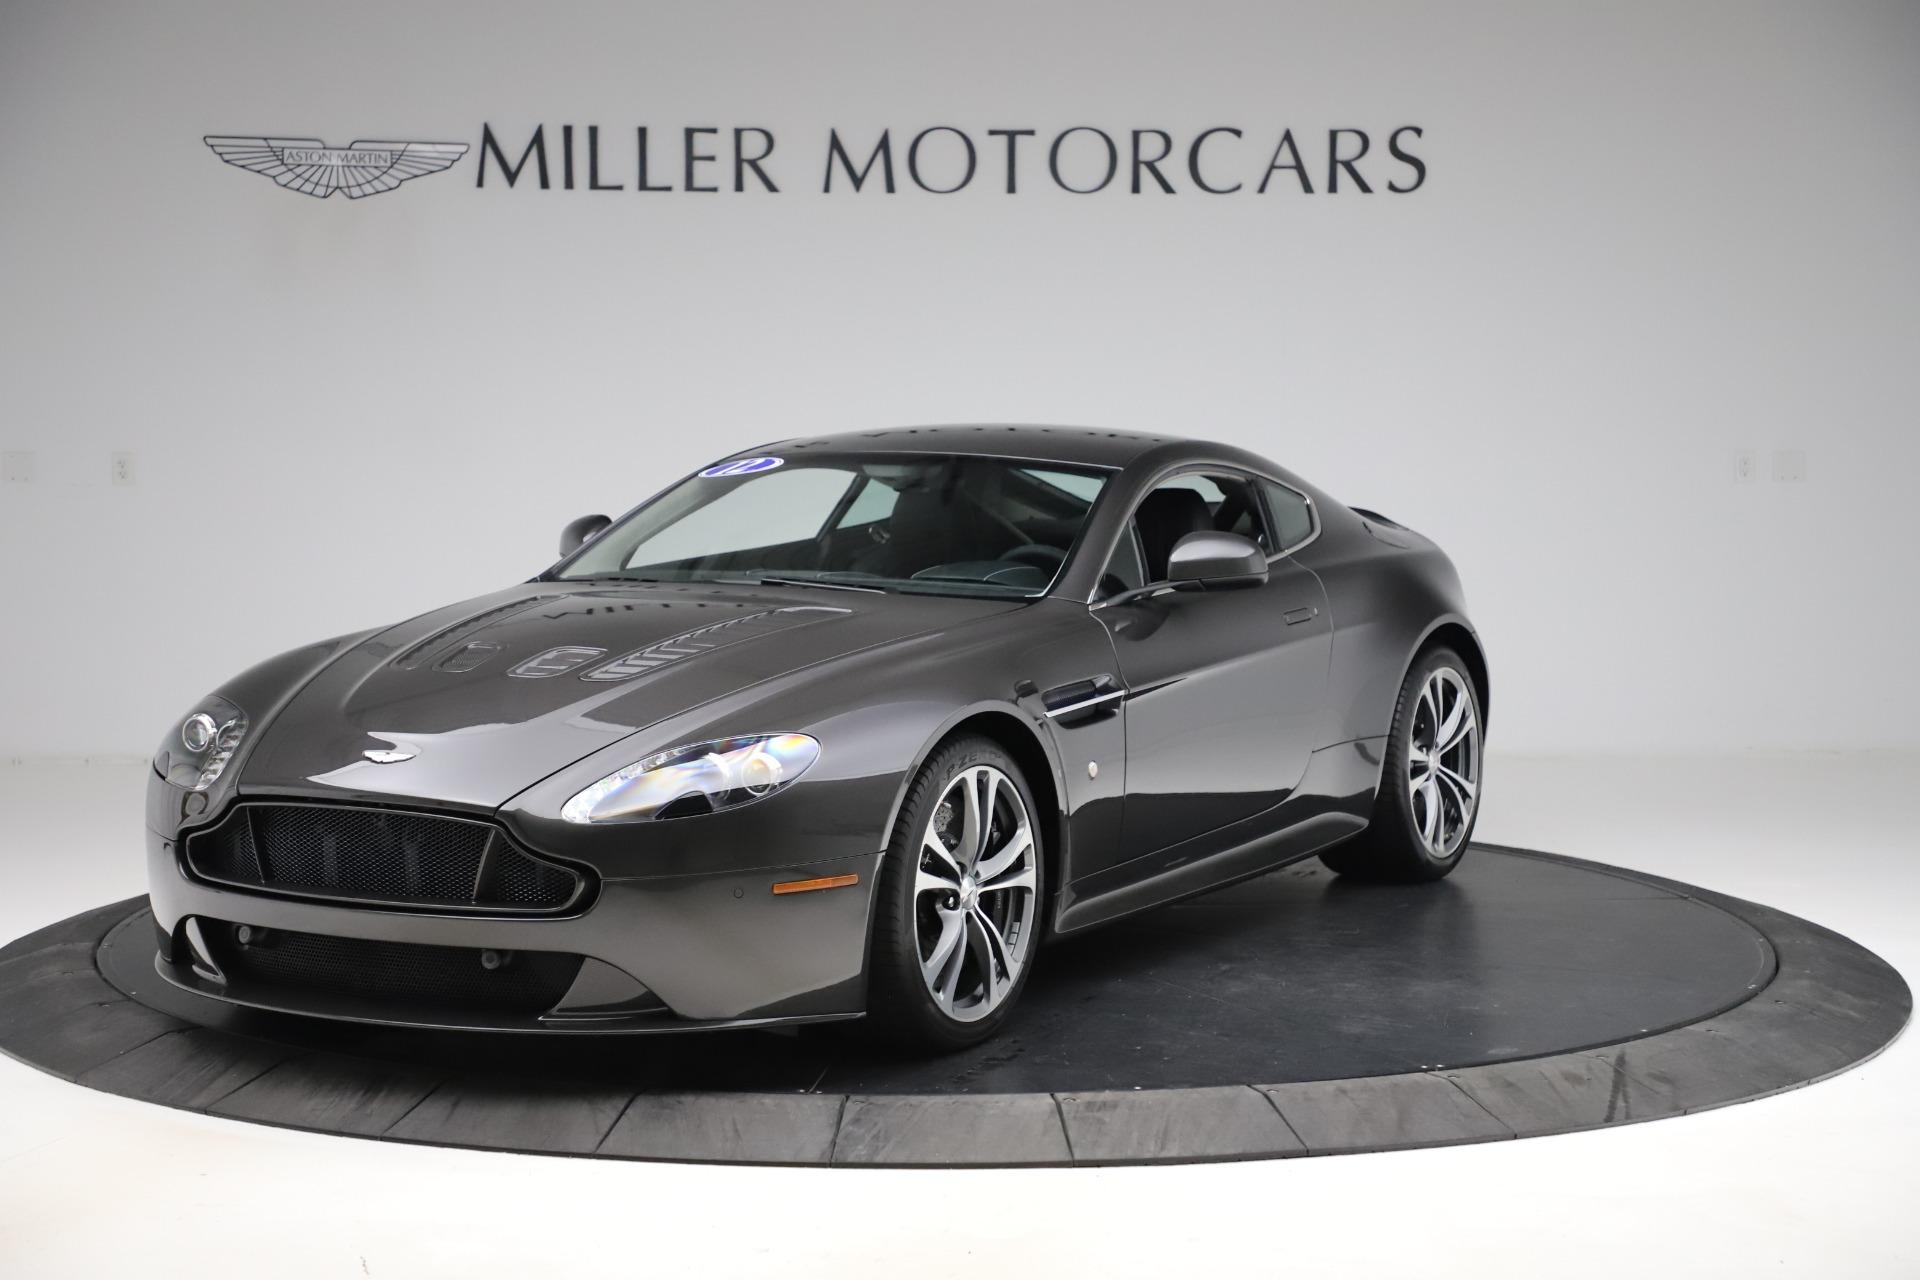 Pre Owned 2012 Aston Martin V12 Vantage Coupe For Sale 115 900 Miller Motorcars Stock 7775